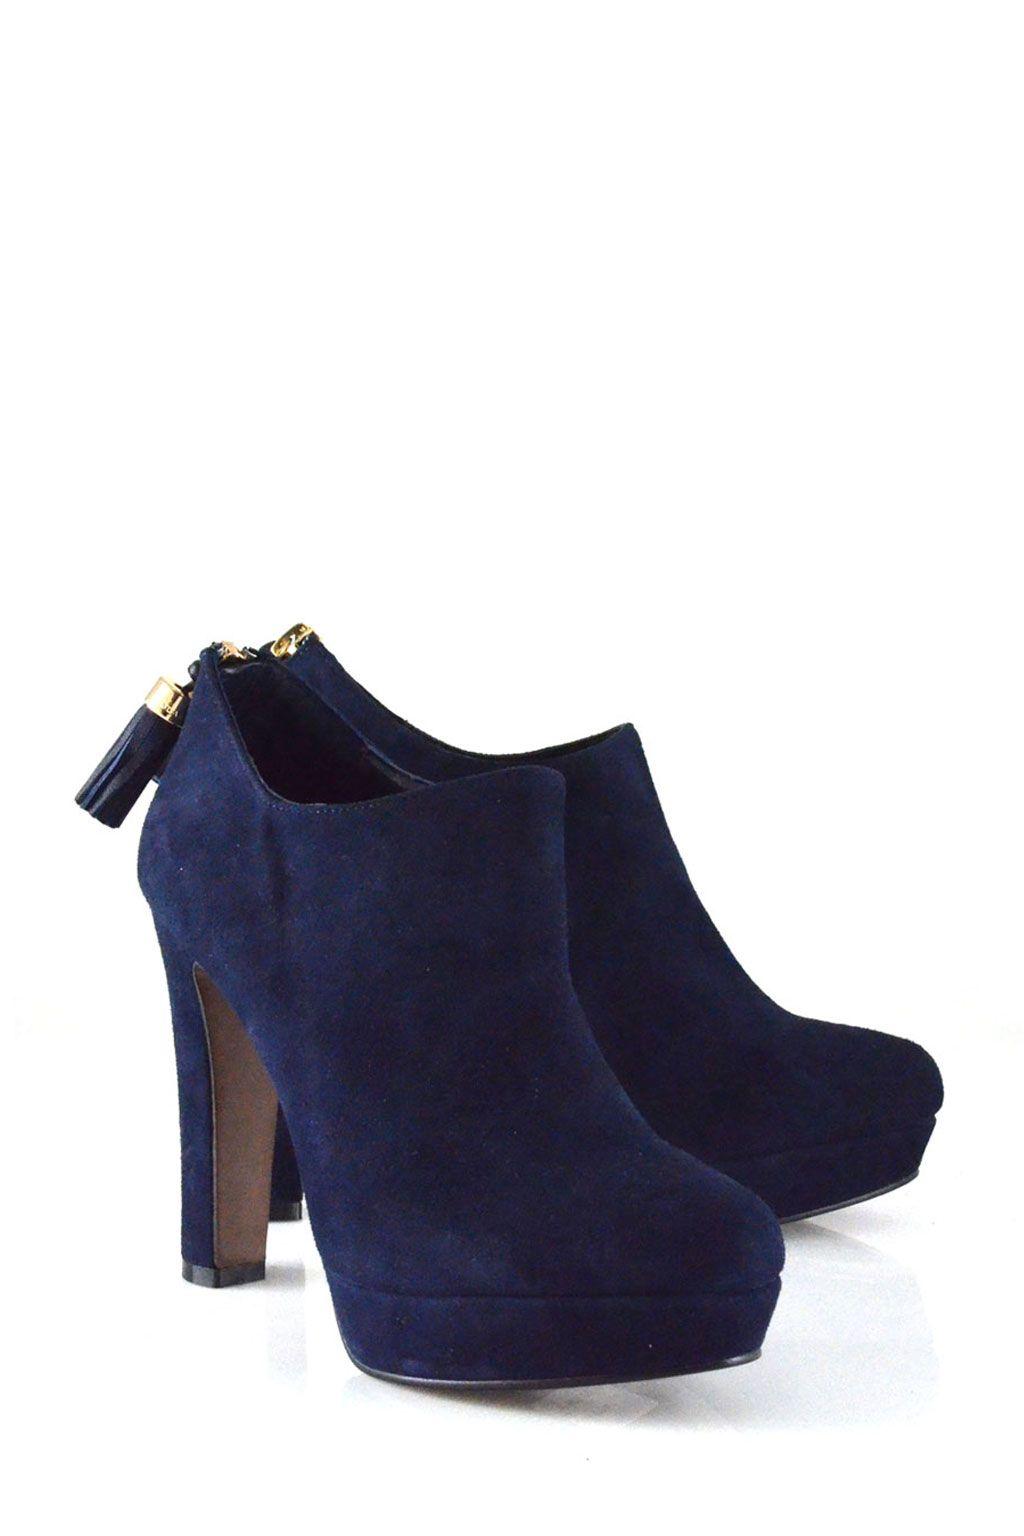 brand new 0fd0e 6a76a Lola Cruz blue ankle boots >> shop online at www.louloushoes ...